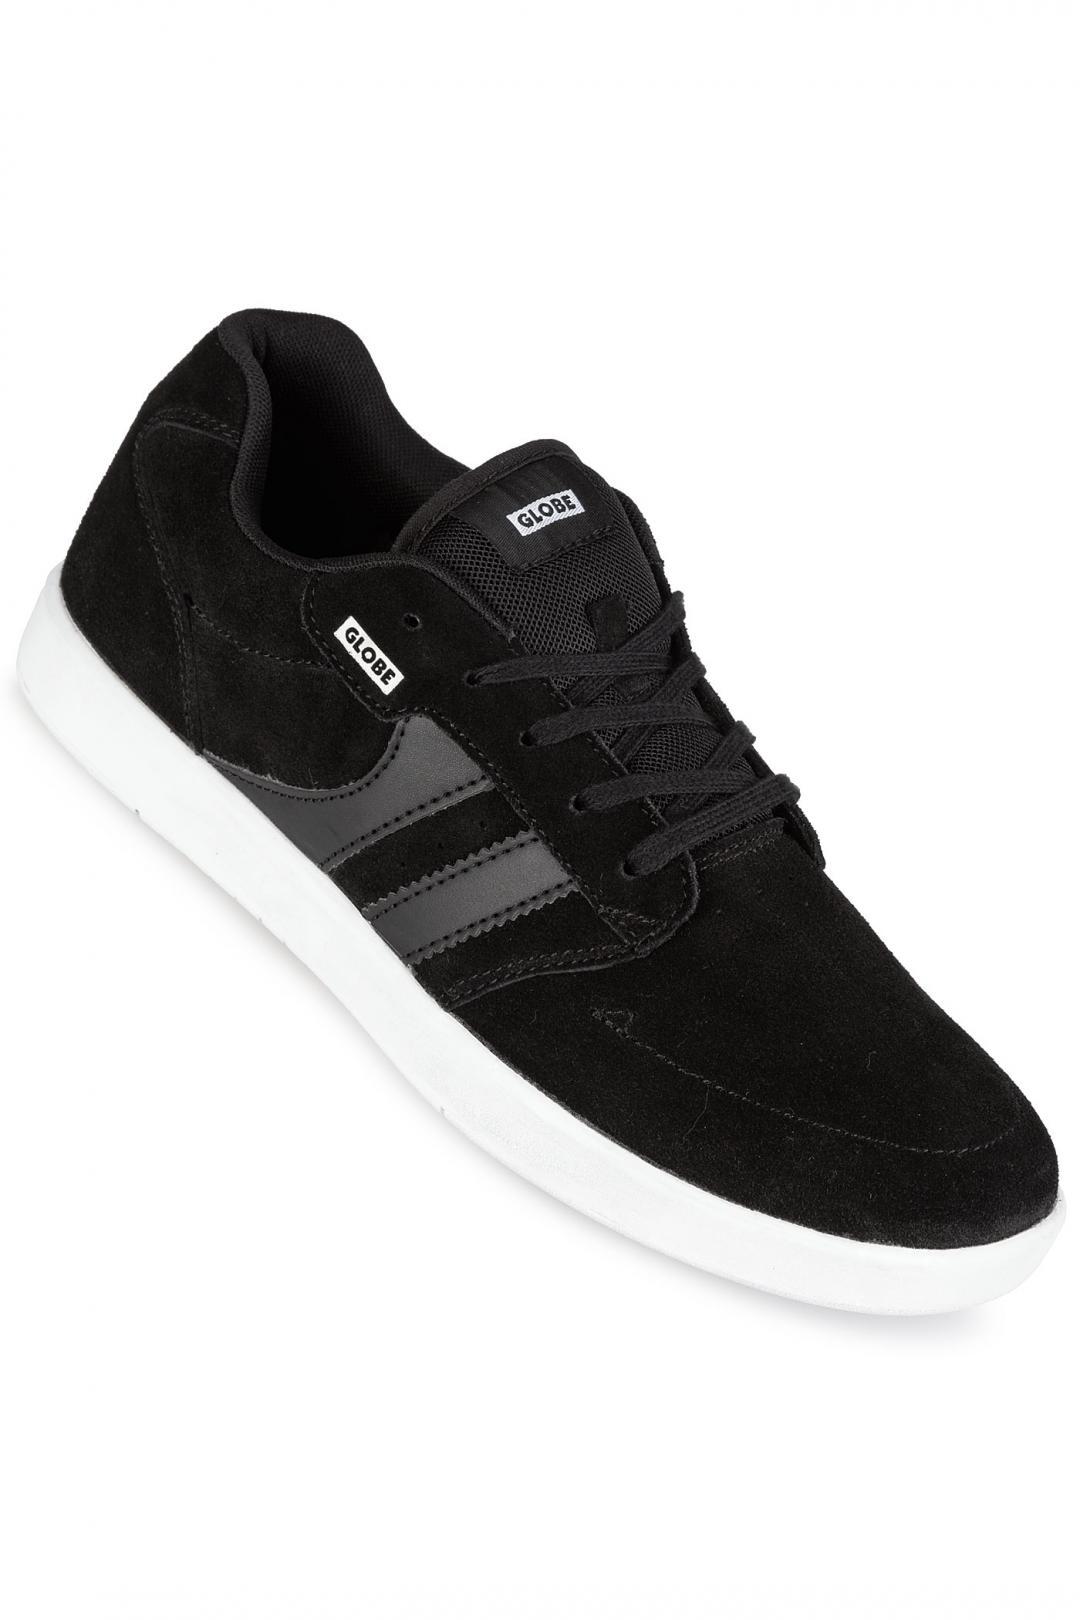 Uomo Globe Octave black white | Sneakers low top